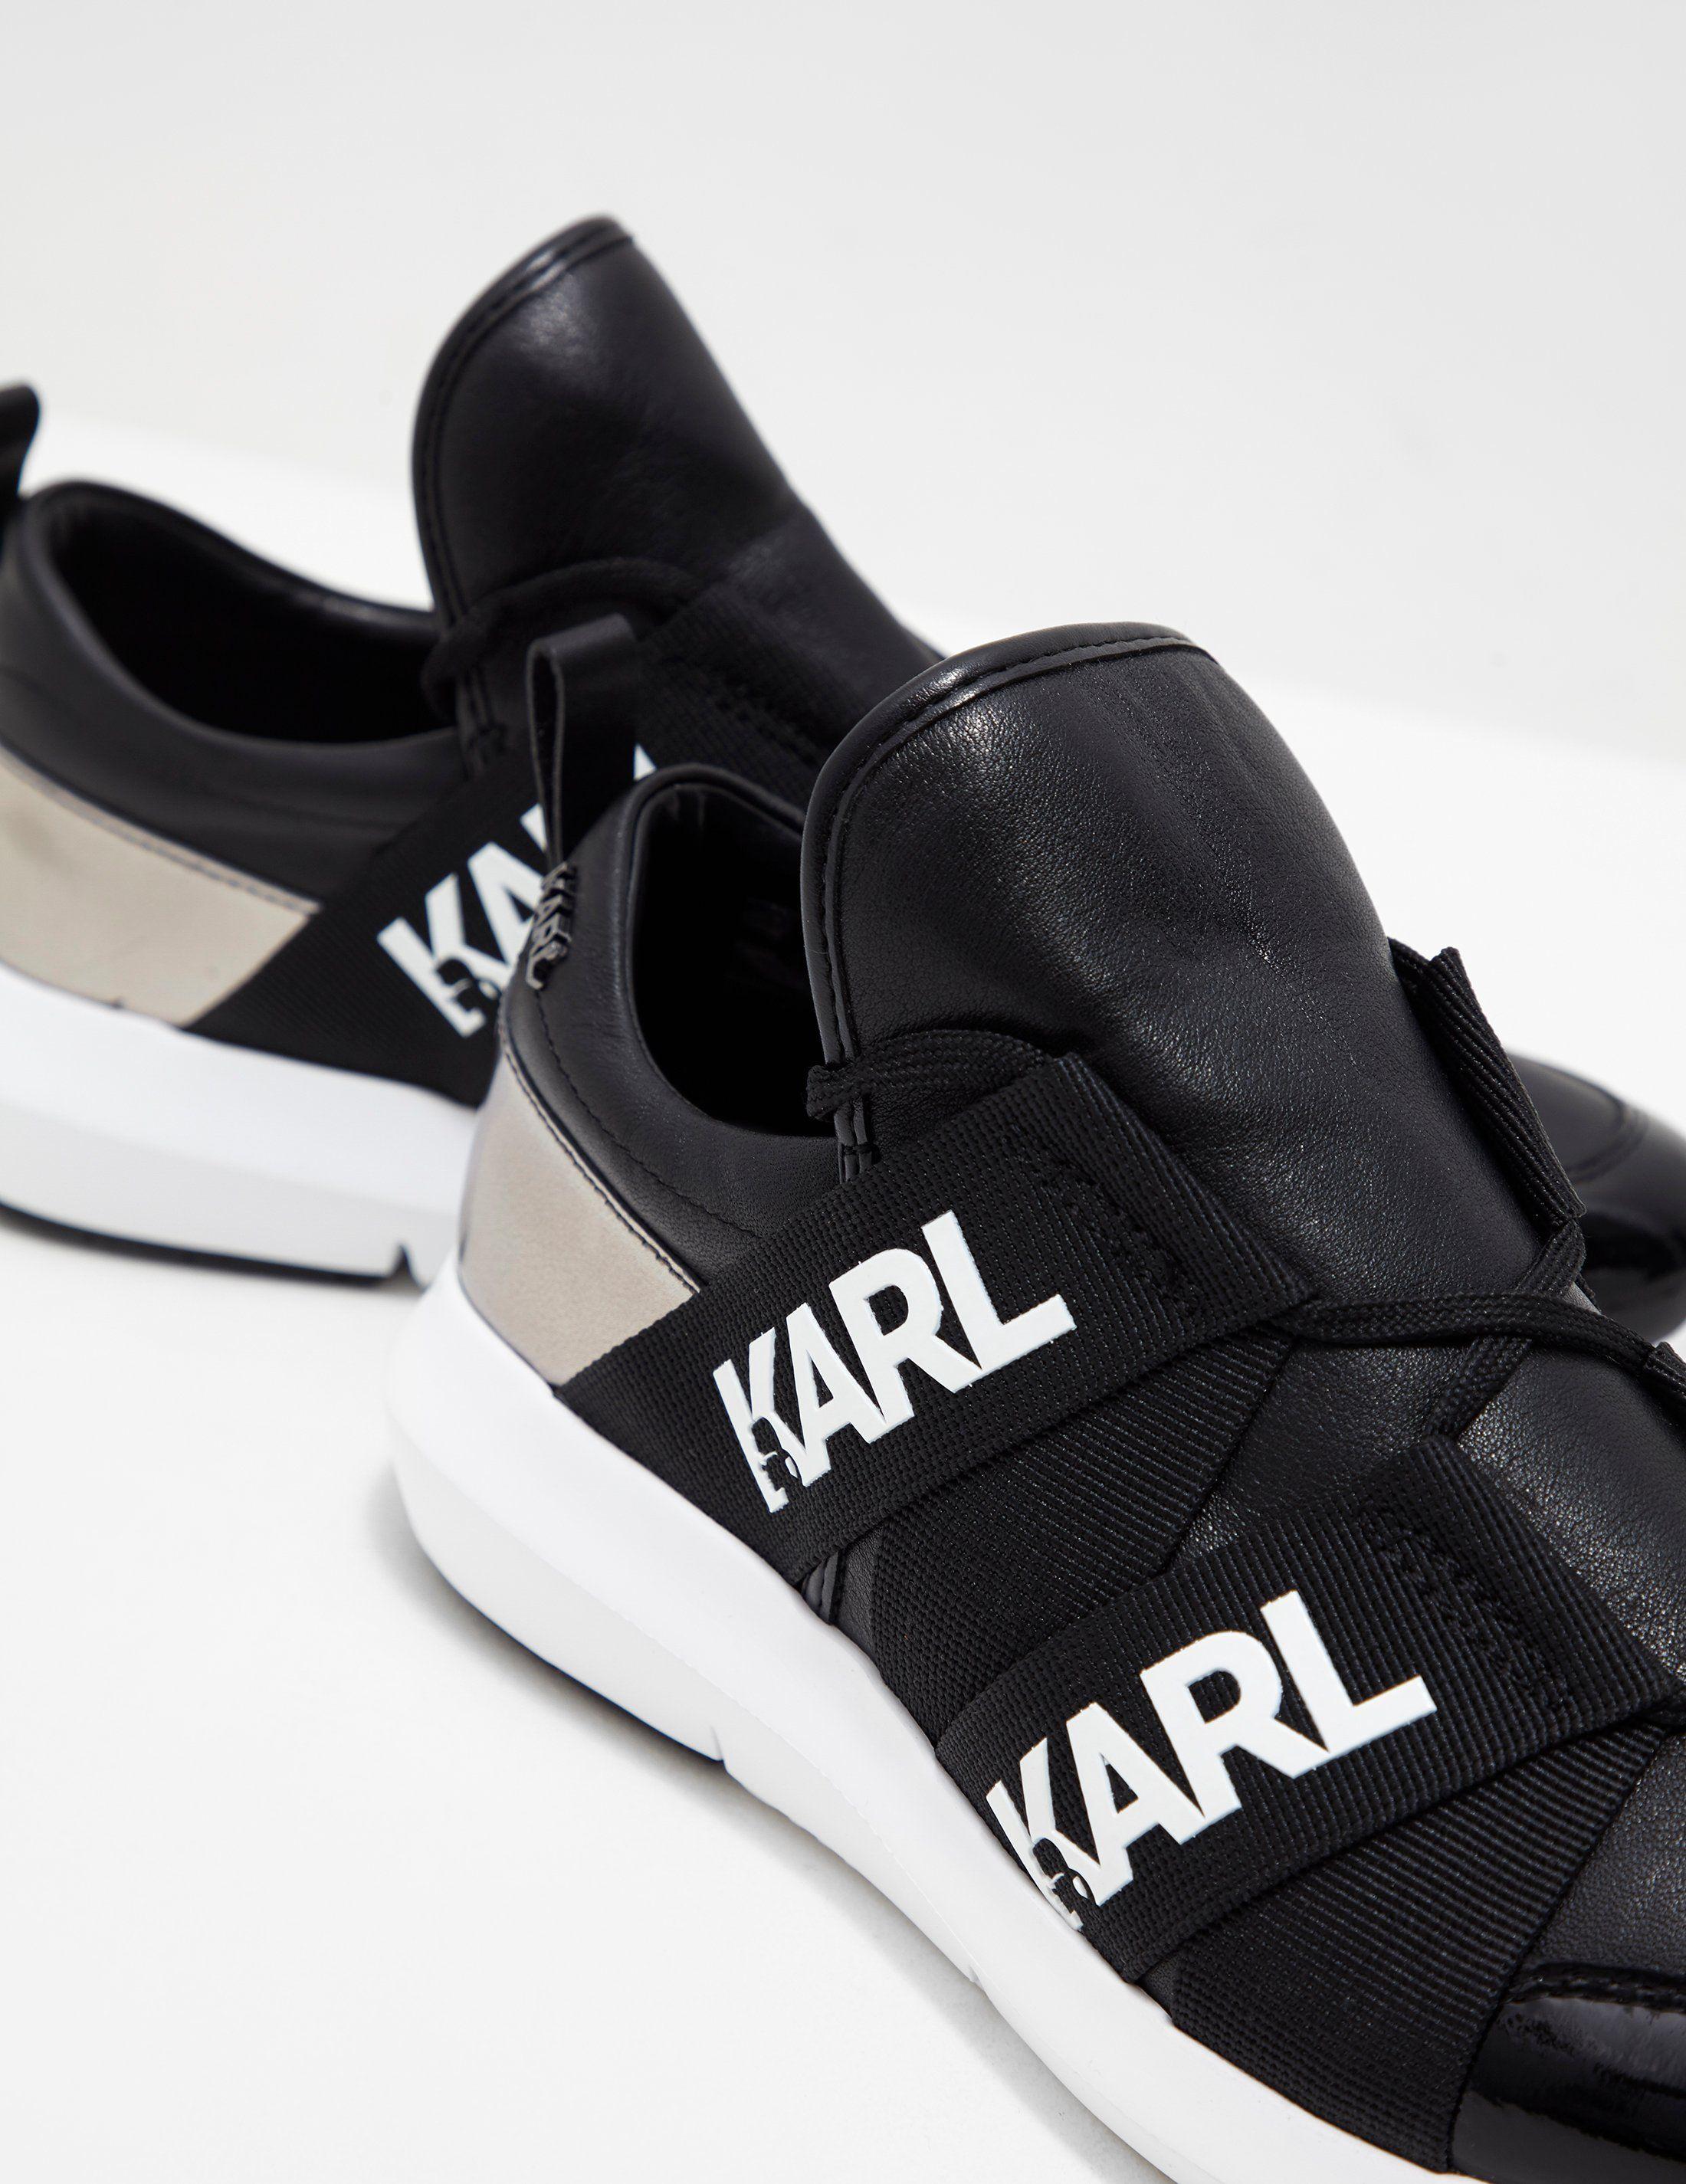 Karl Lagerfeld Strap Trainers